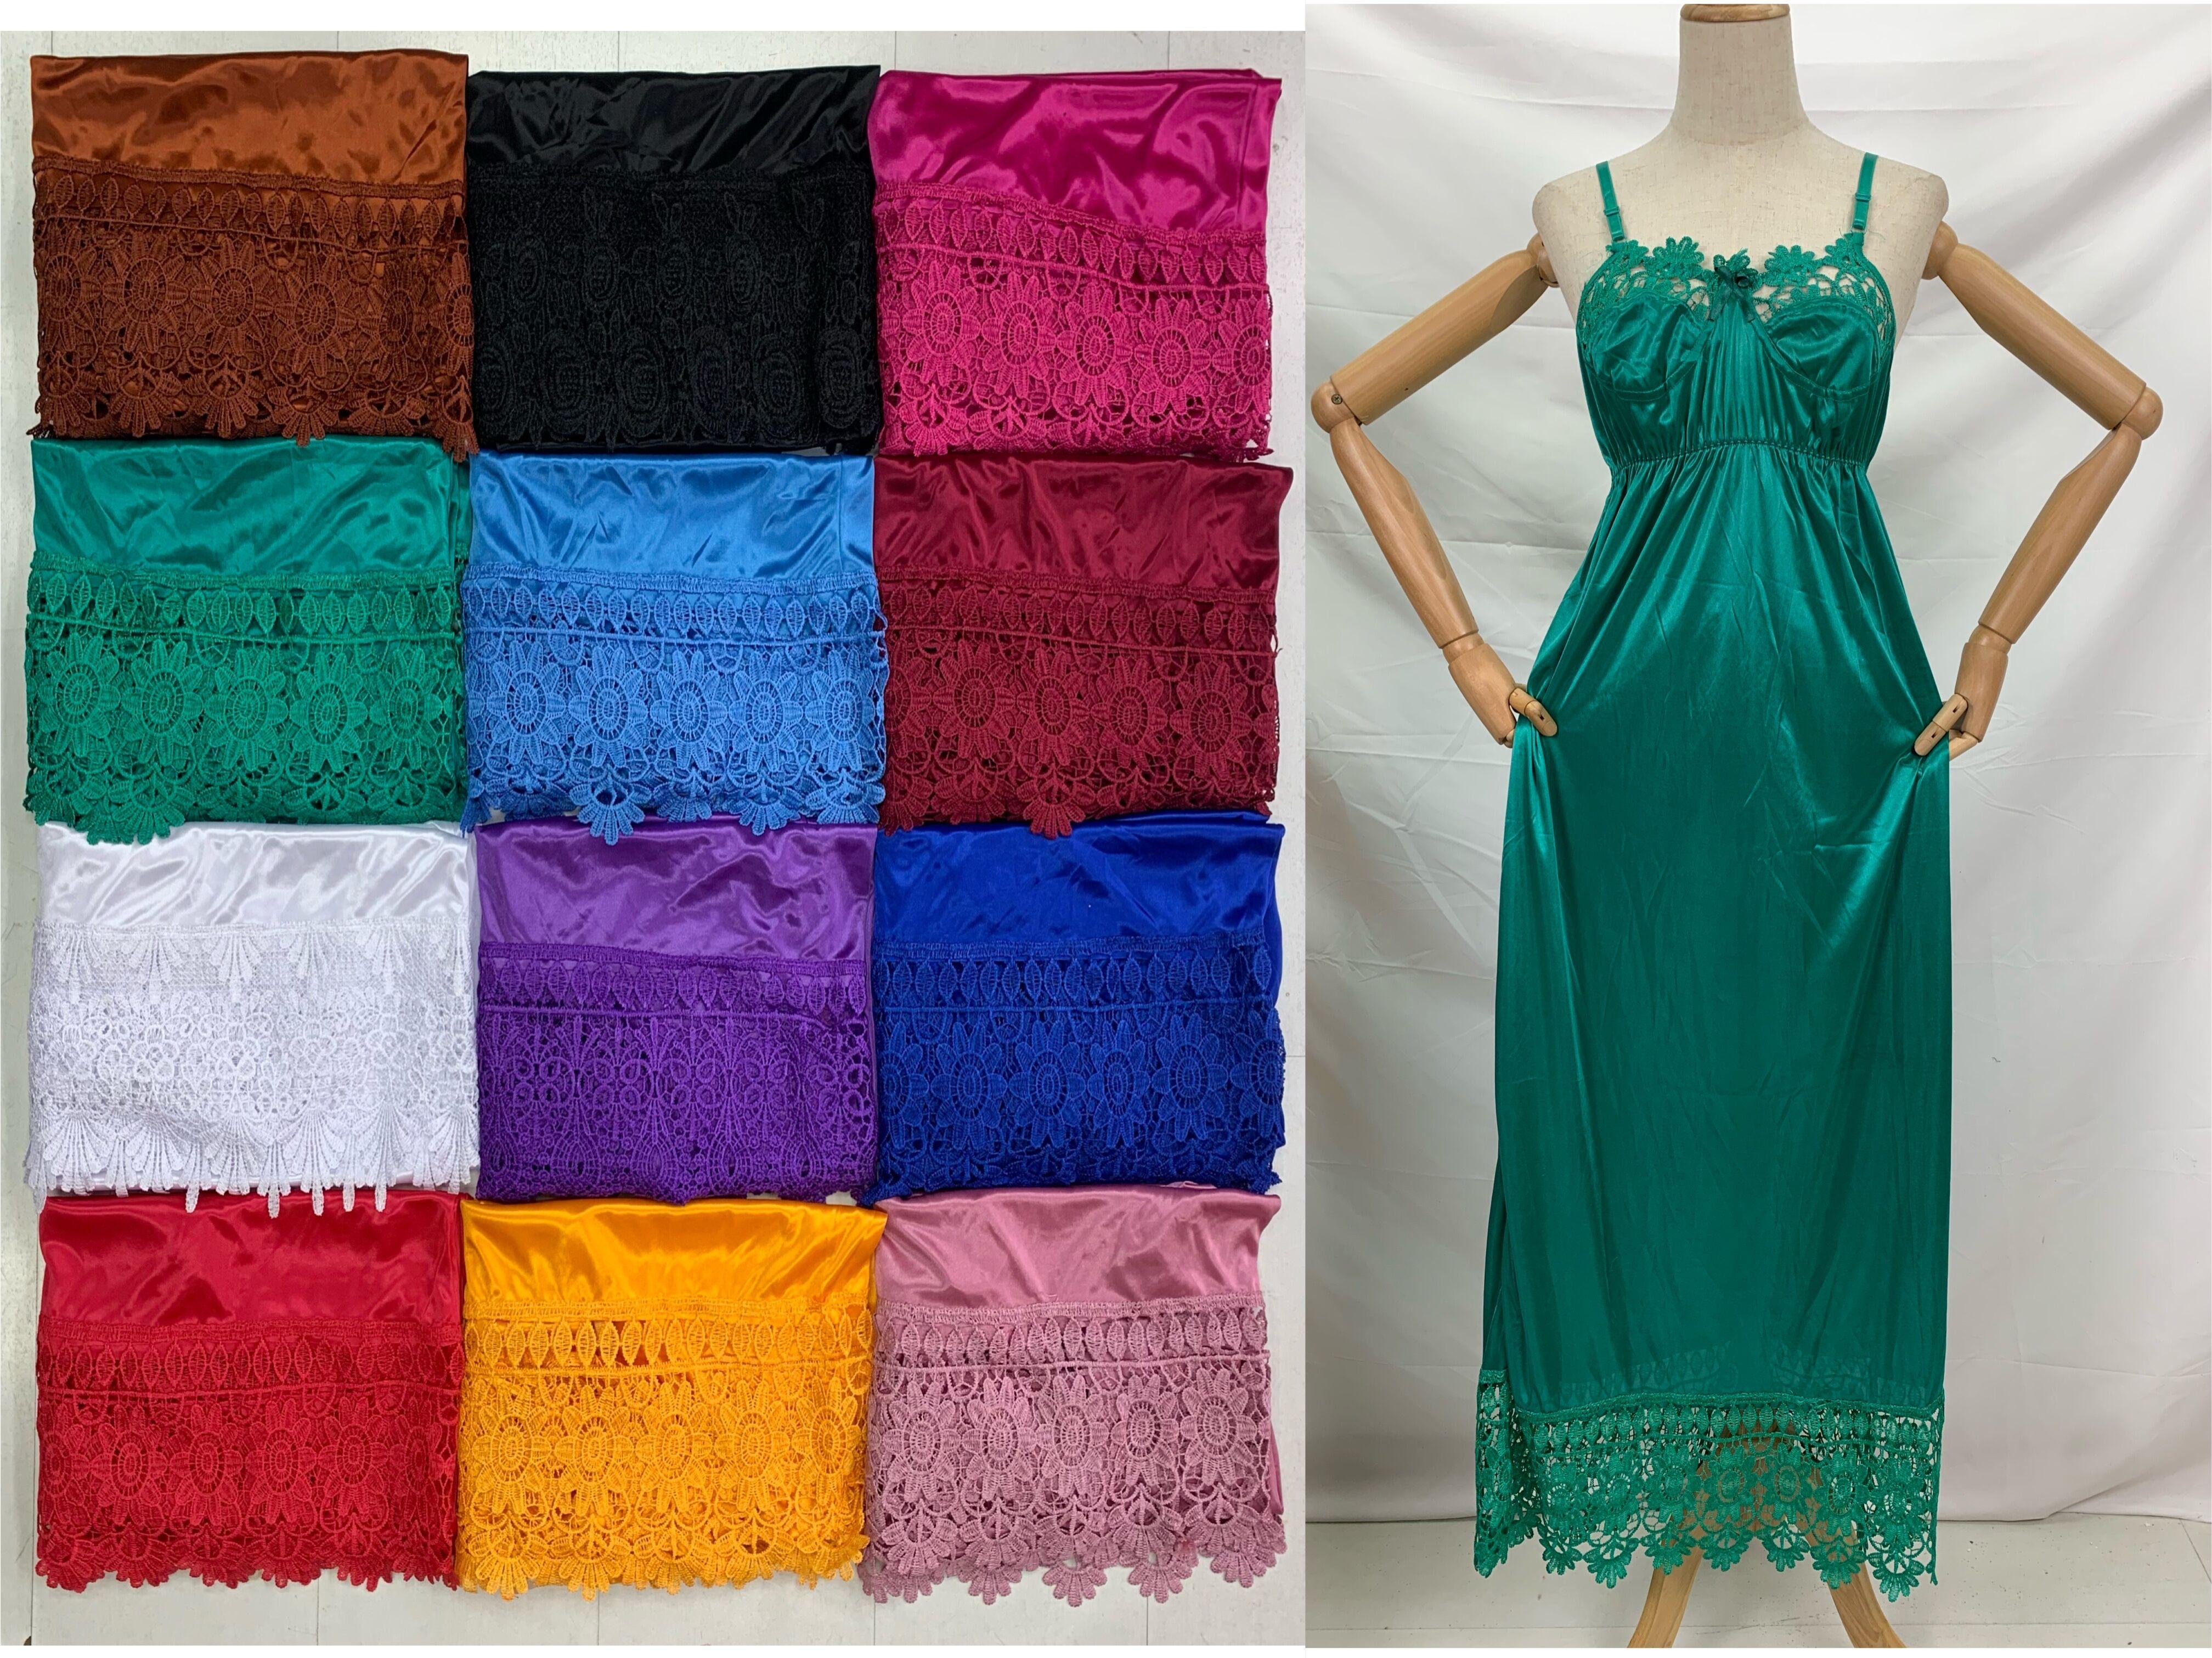 12 pcs/1 dozen Plus Size Women Sexy Silk Satin Night Lace Dress Sleeveless Nighties Condole Belt Skirt Sleepwear